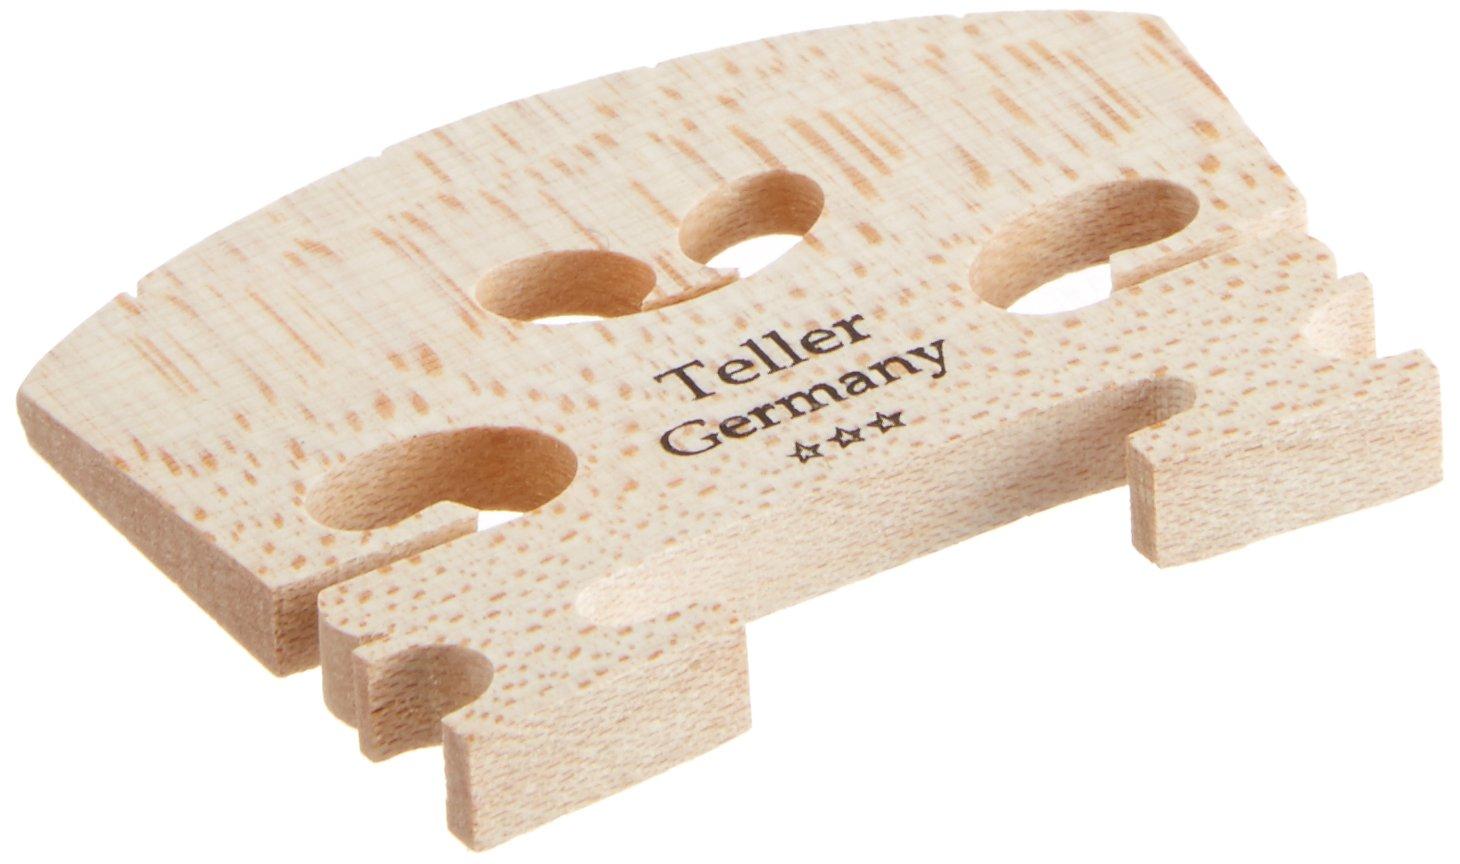 Josef Teller Aubert Ebony V Maple Violin Bridge - Low Action 4/4